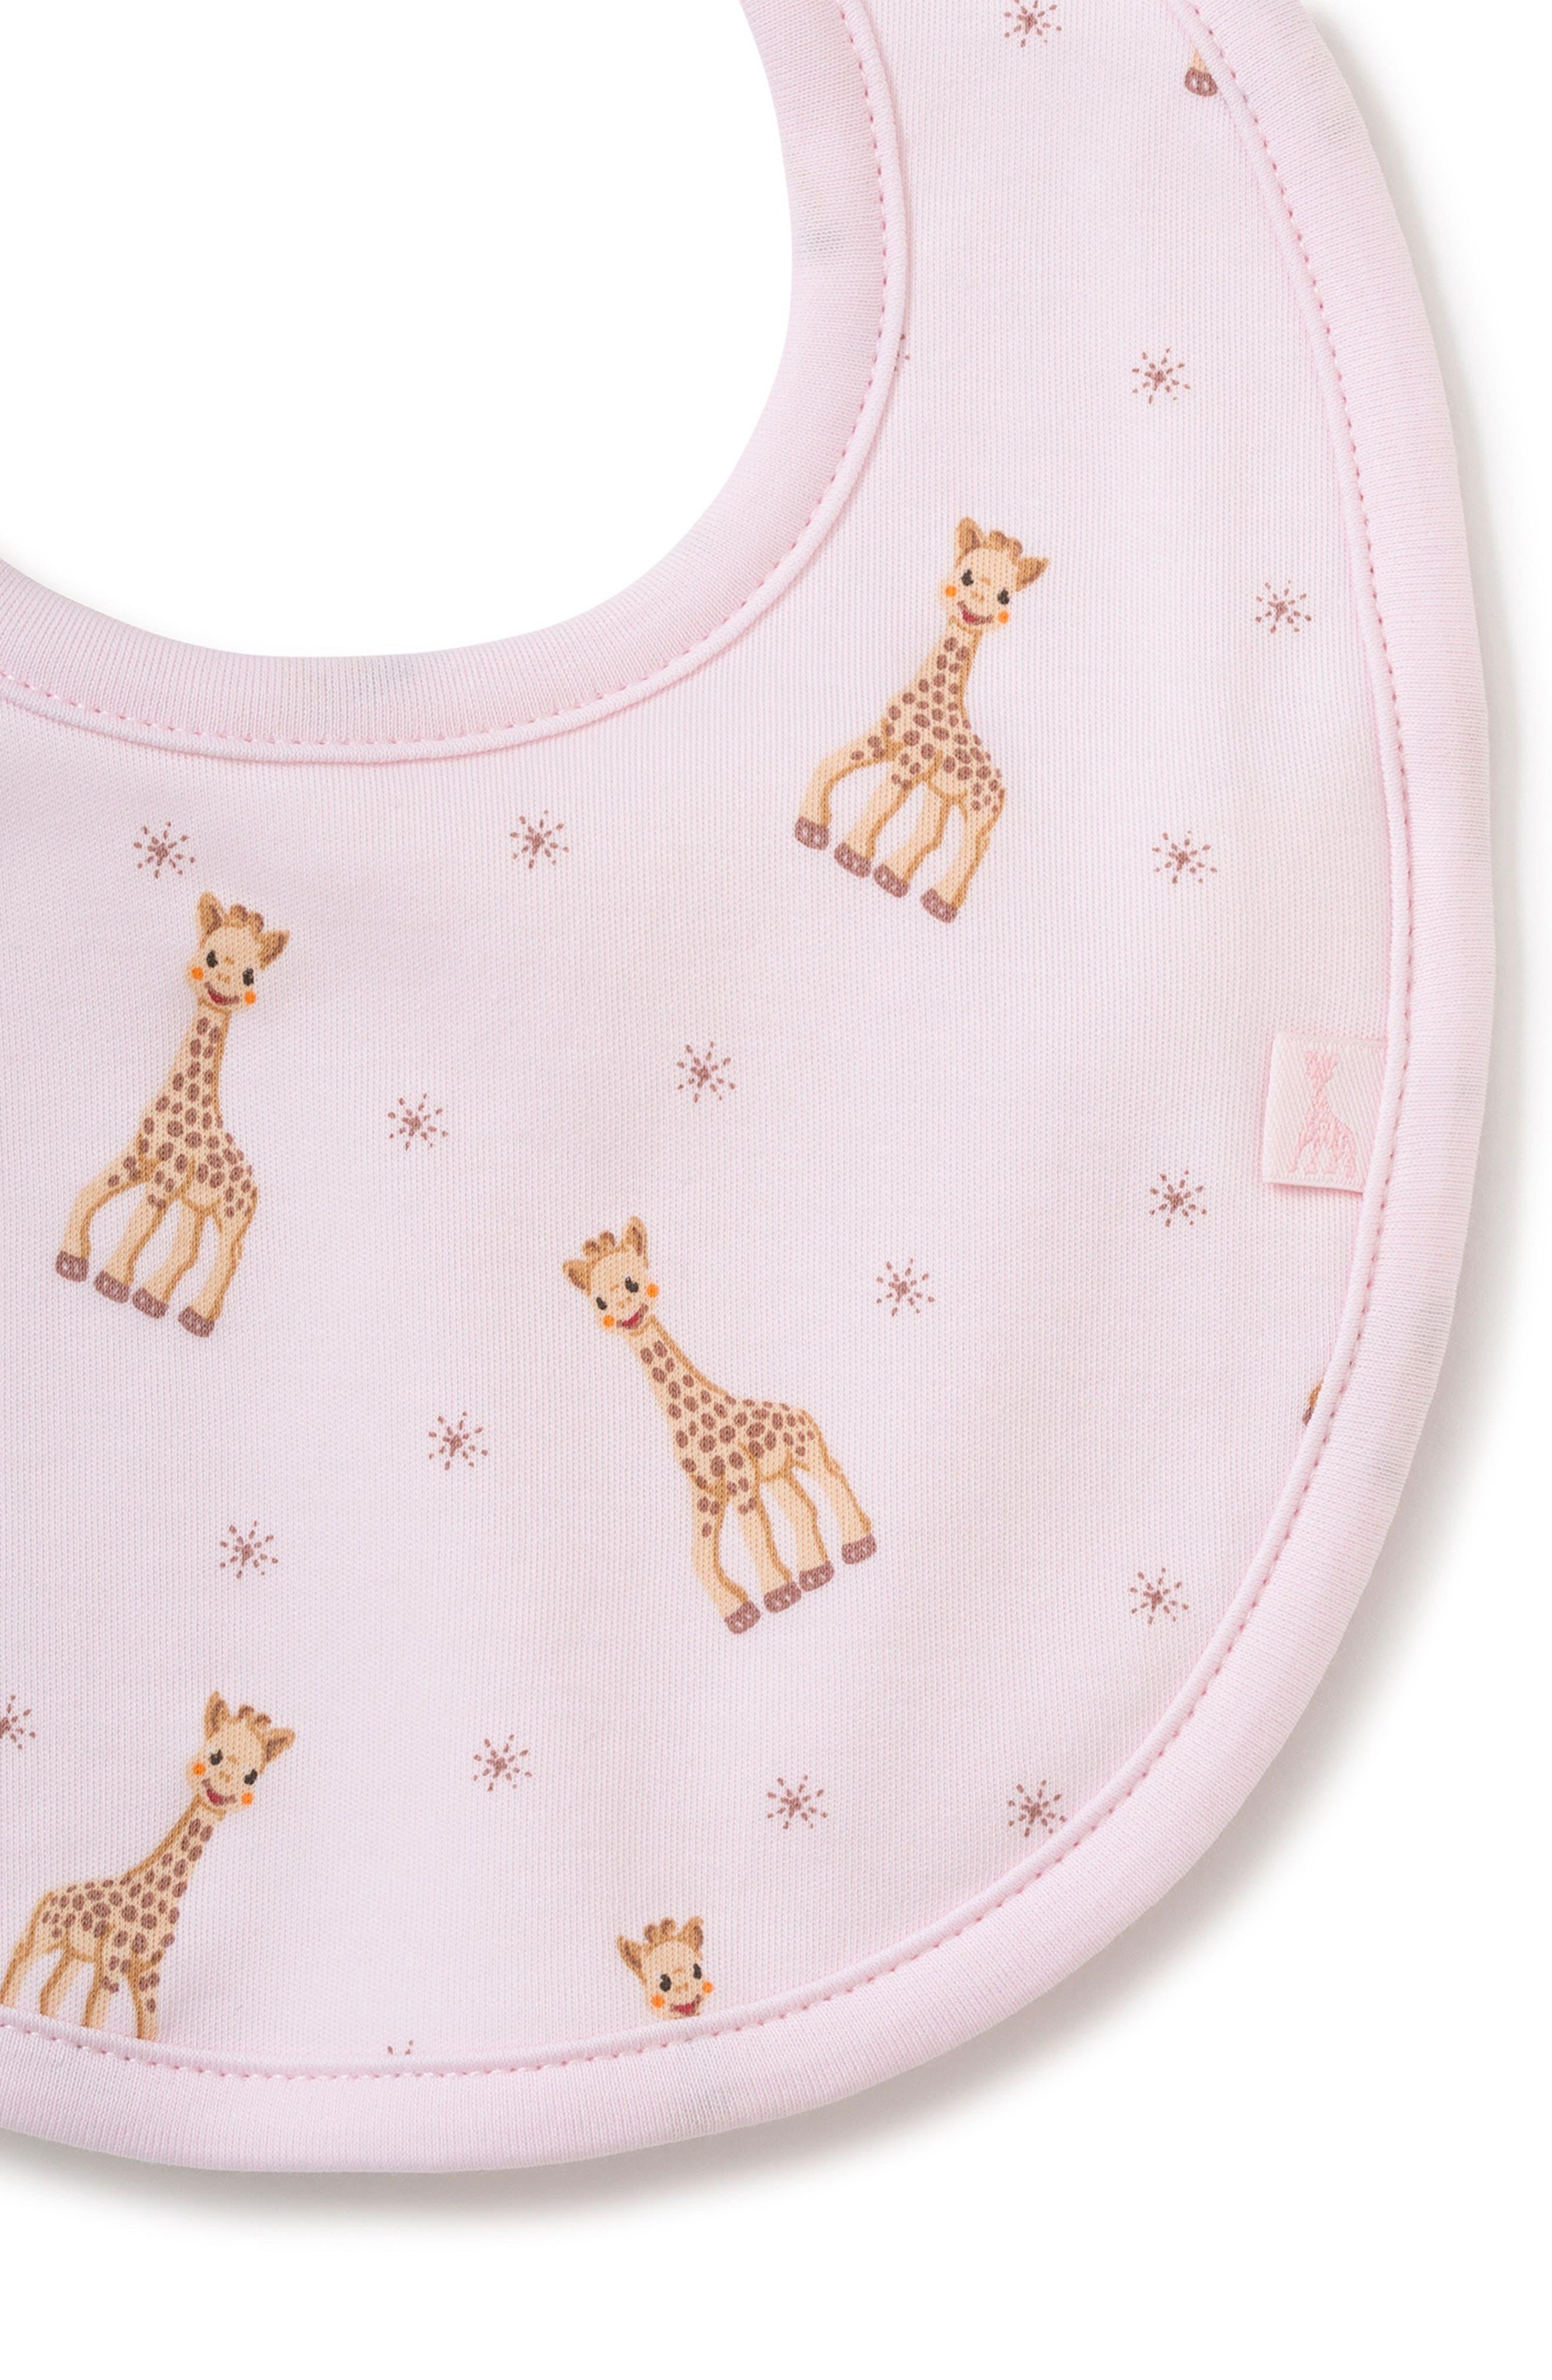 x Sophie la Girafe Bib,                             Alternate thumbnail 2, color,                             Pink